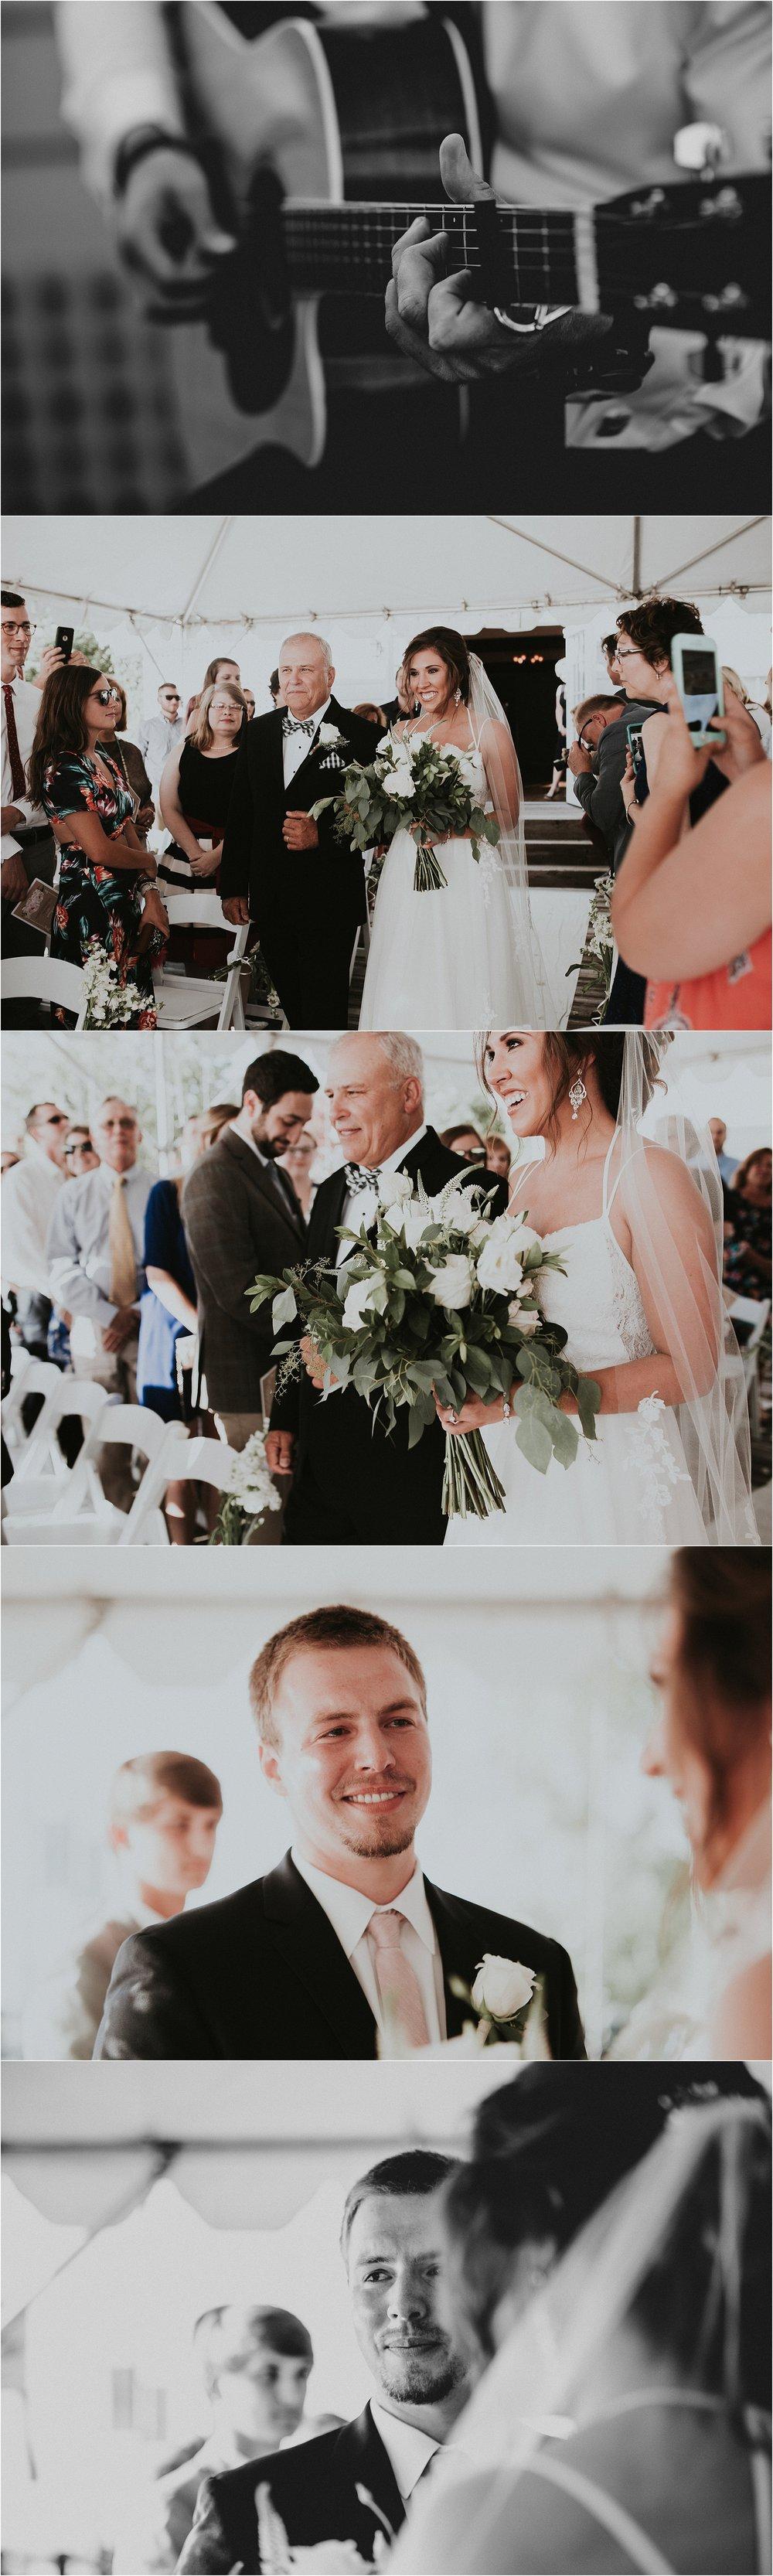 Riverwalk-Landing-wedding-wilmington-NC_0032.jpg